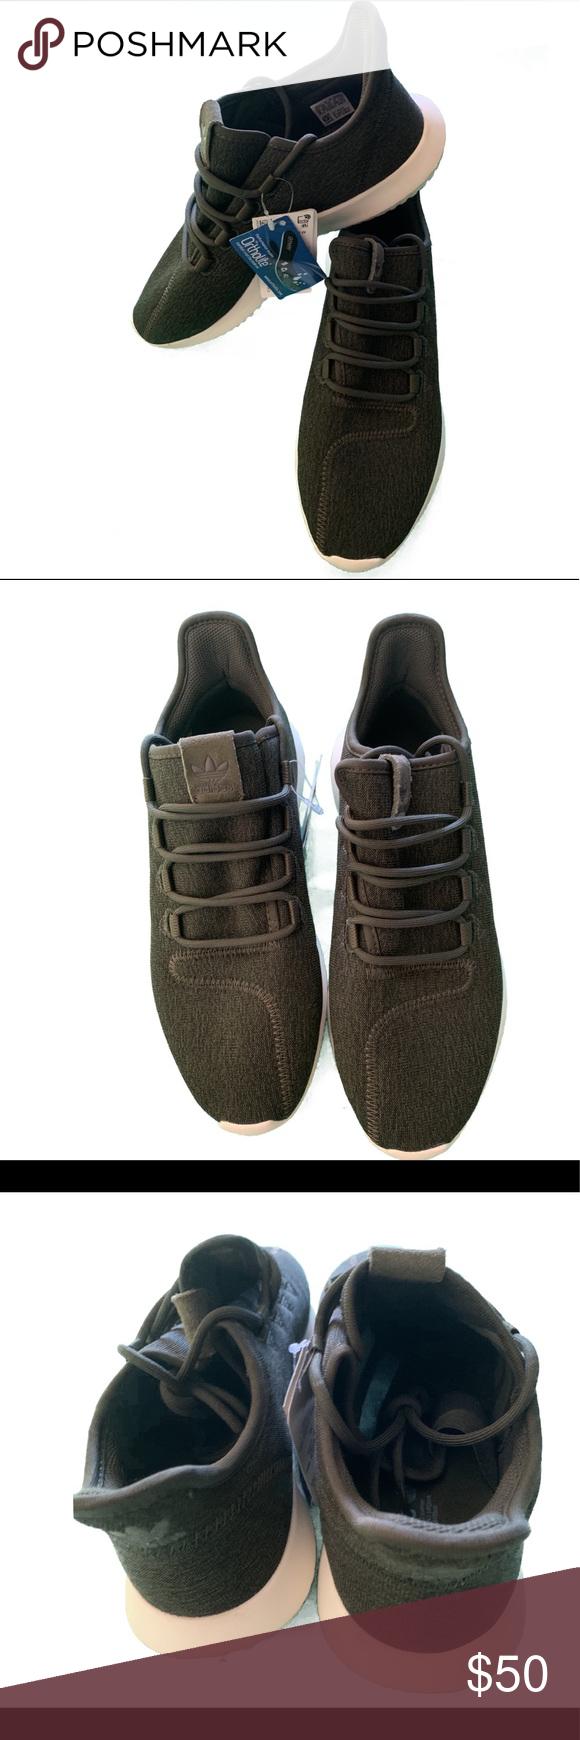 NEW Adidas Tubular Shadow Size 9 | Adidas tubular shadow, Adidas ...